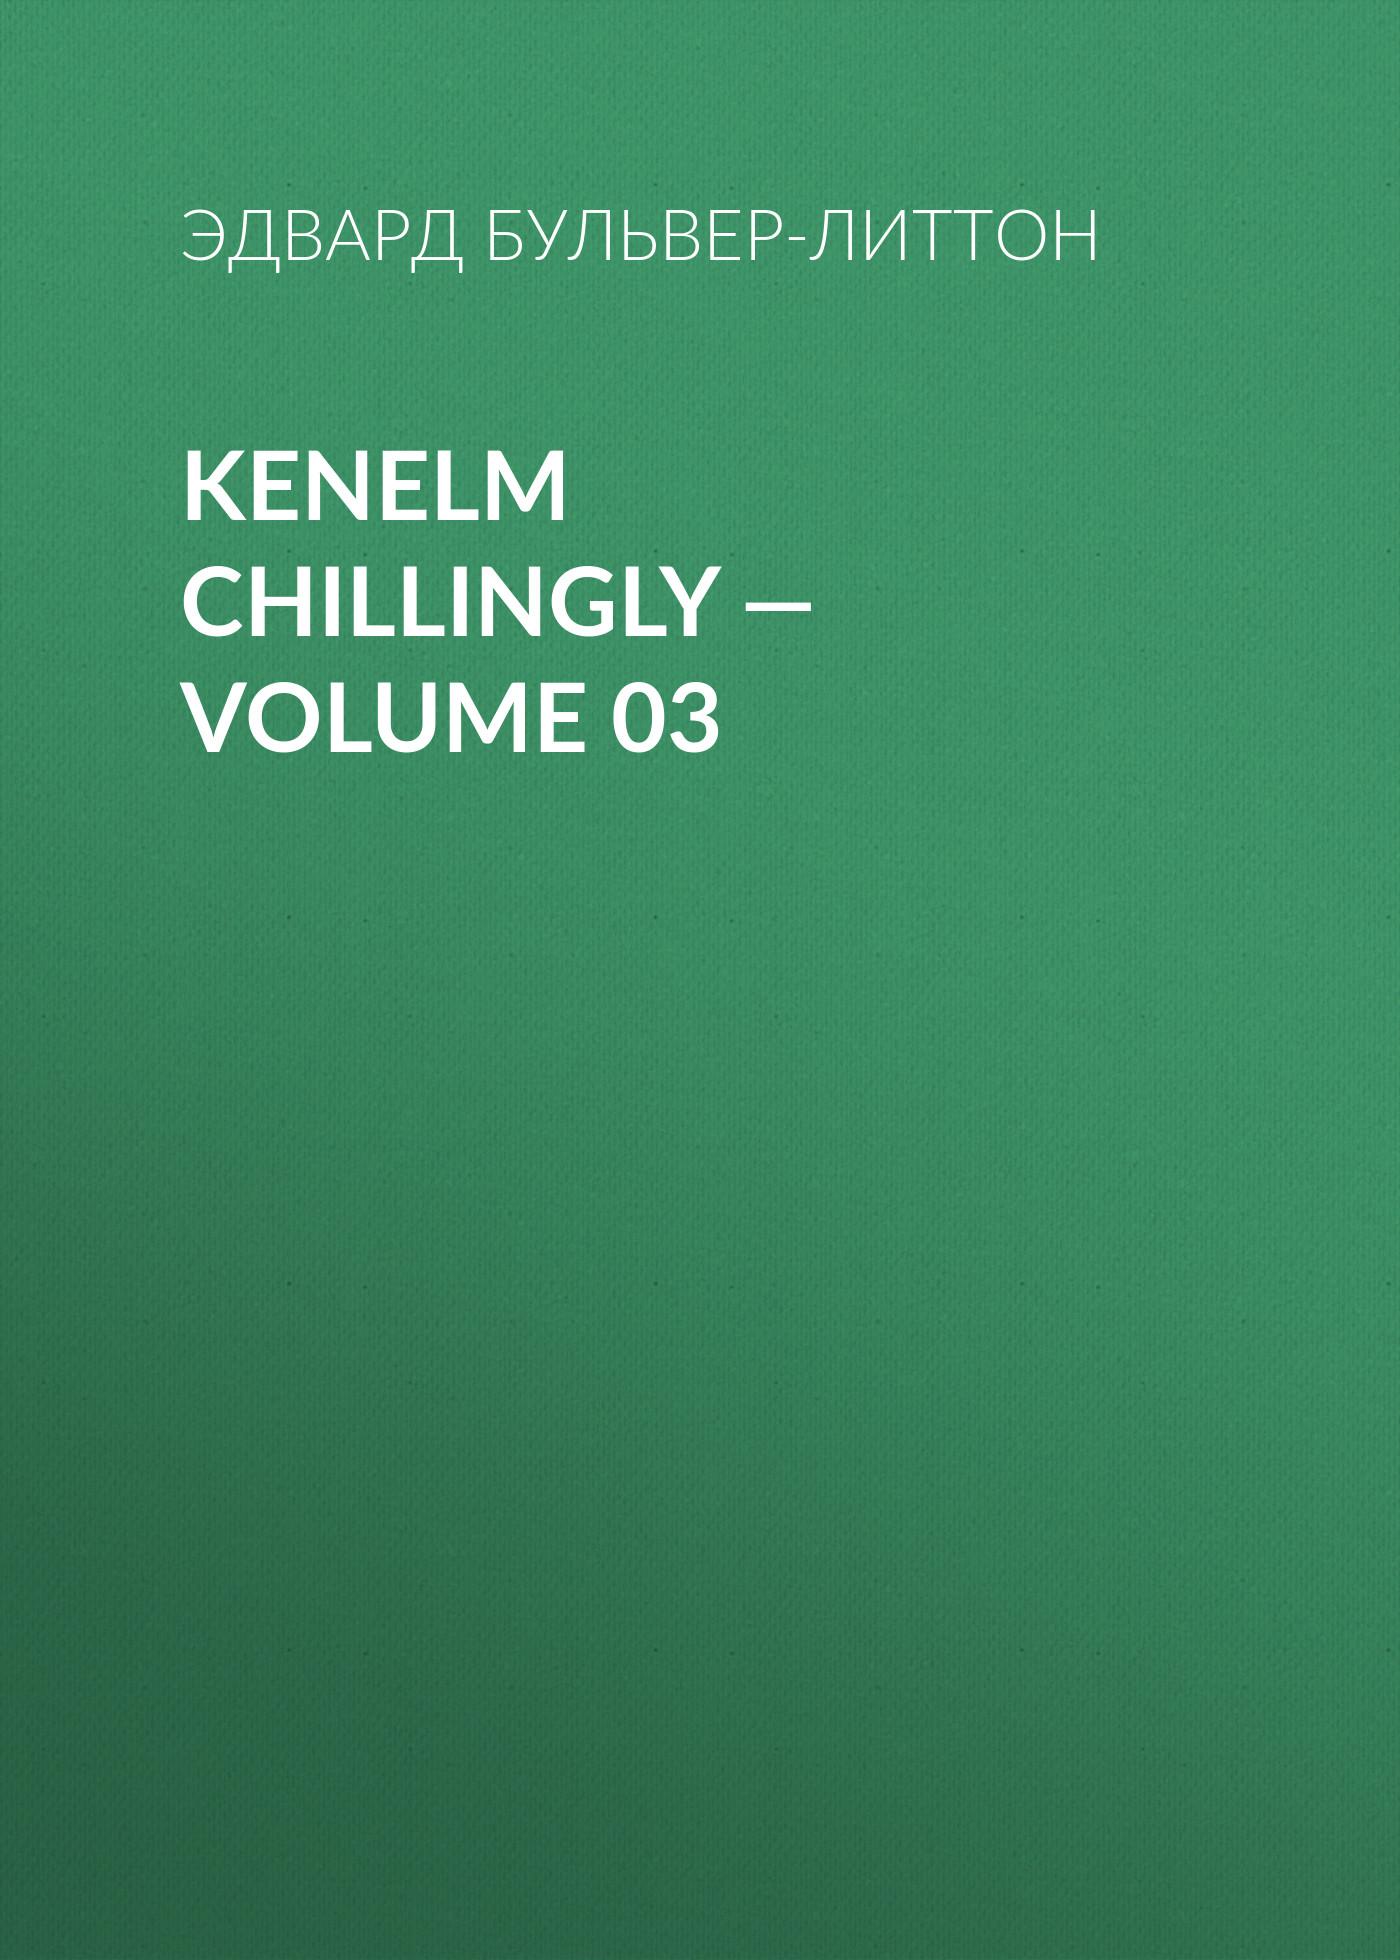 цена Эдвард Бульвер-Литтон Kenelm Chillingly — Volume 03